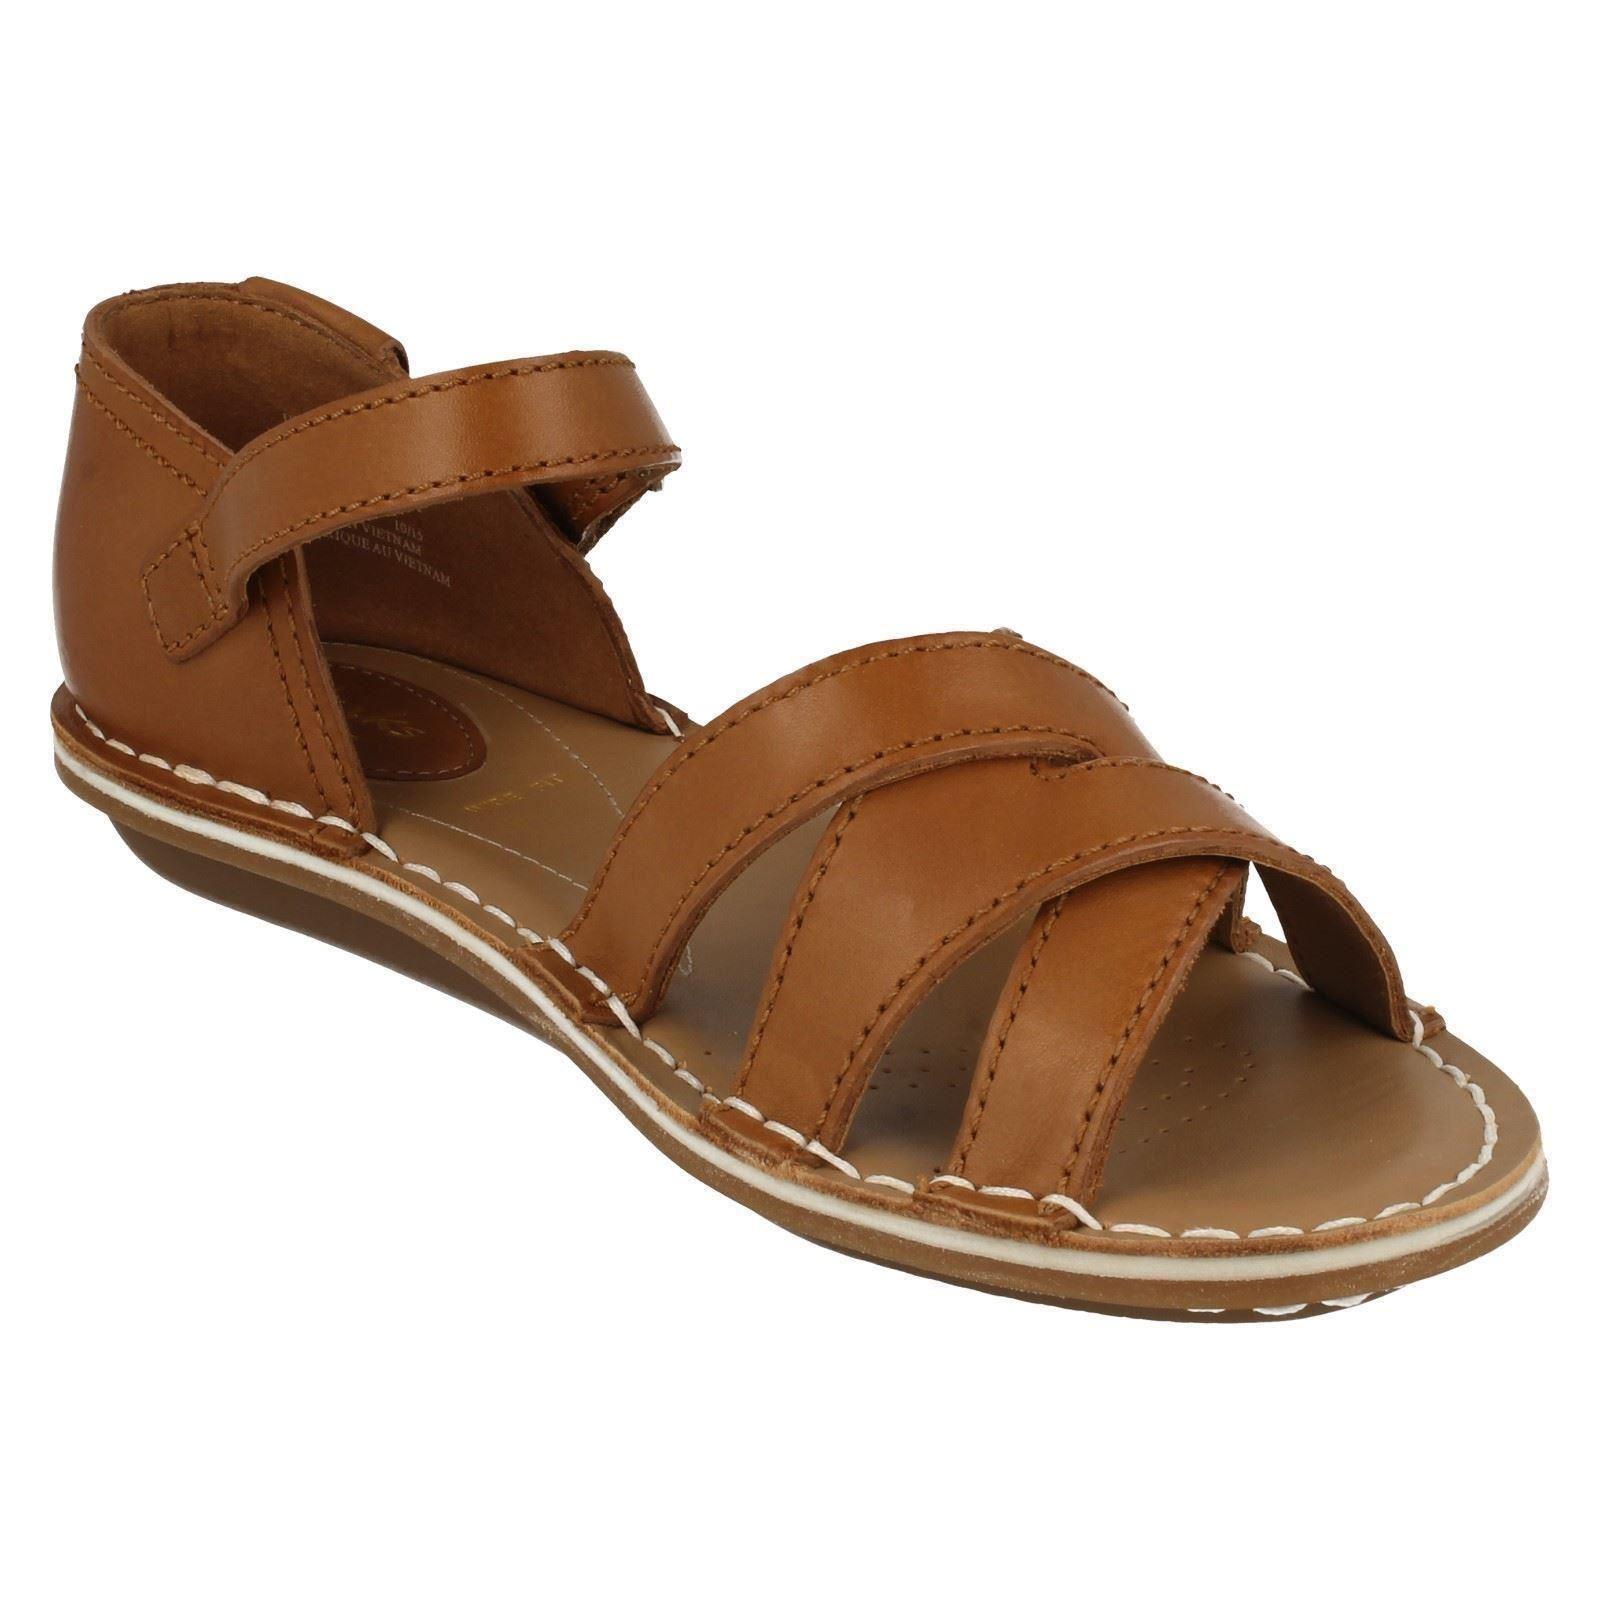 fa7882e0ef4e Buy clarks ladies summer shoes cheap